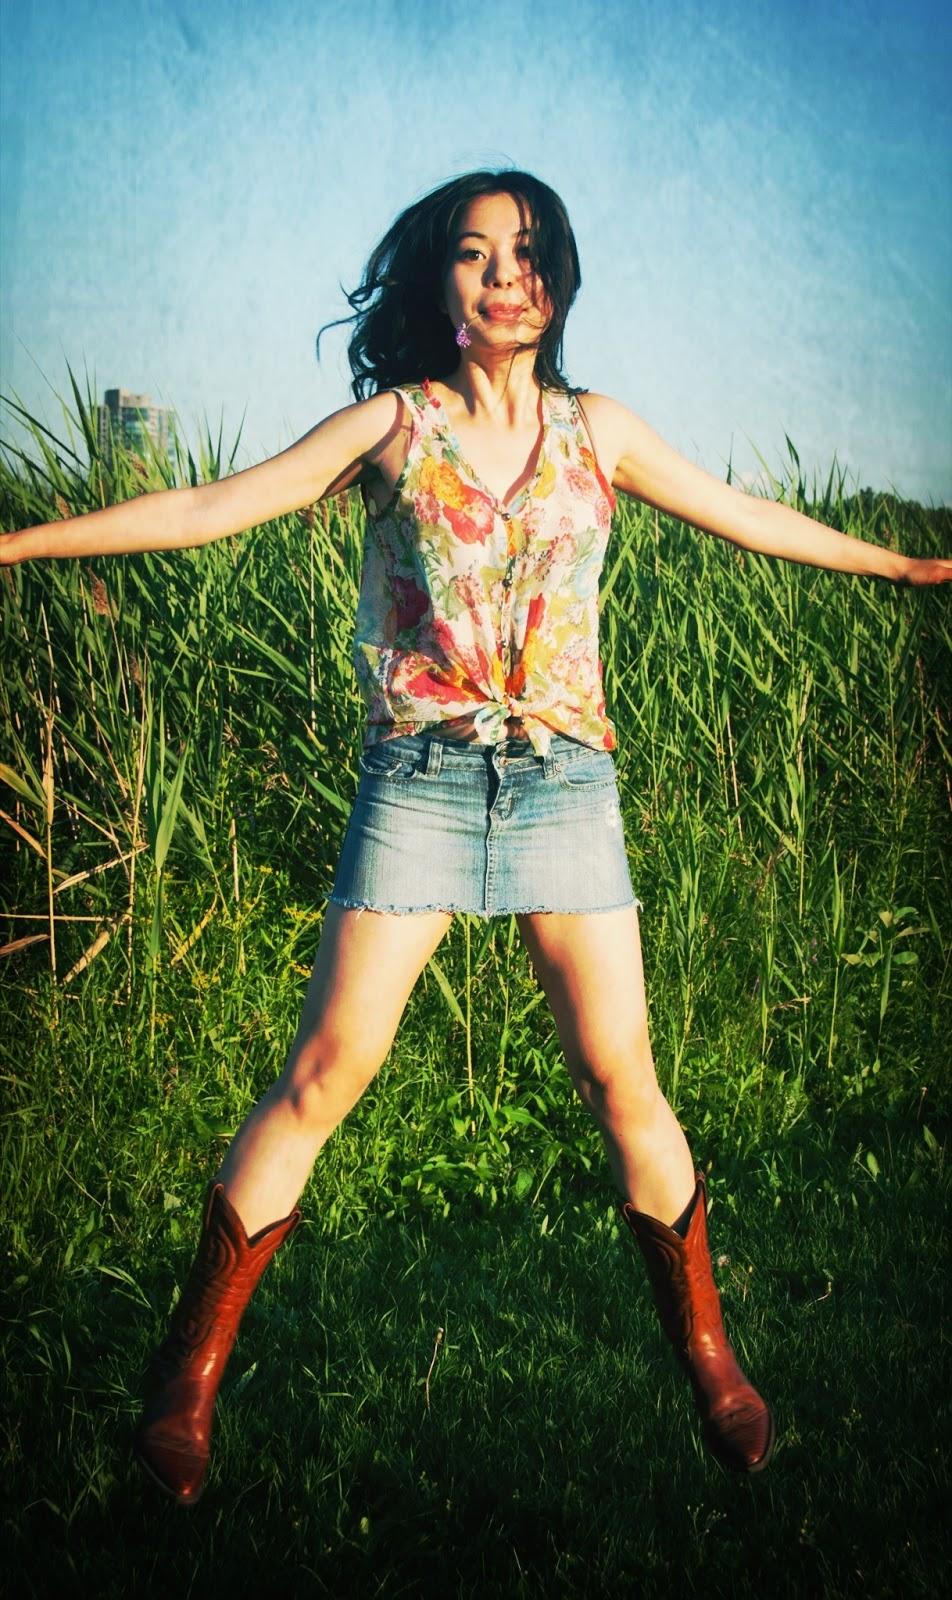 denim jean miniskirt cowboy boots floral top